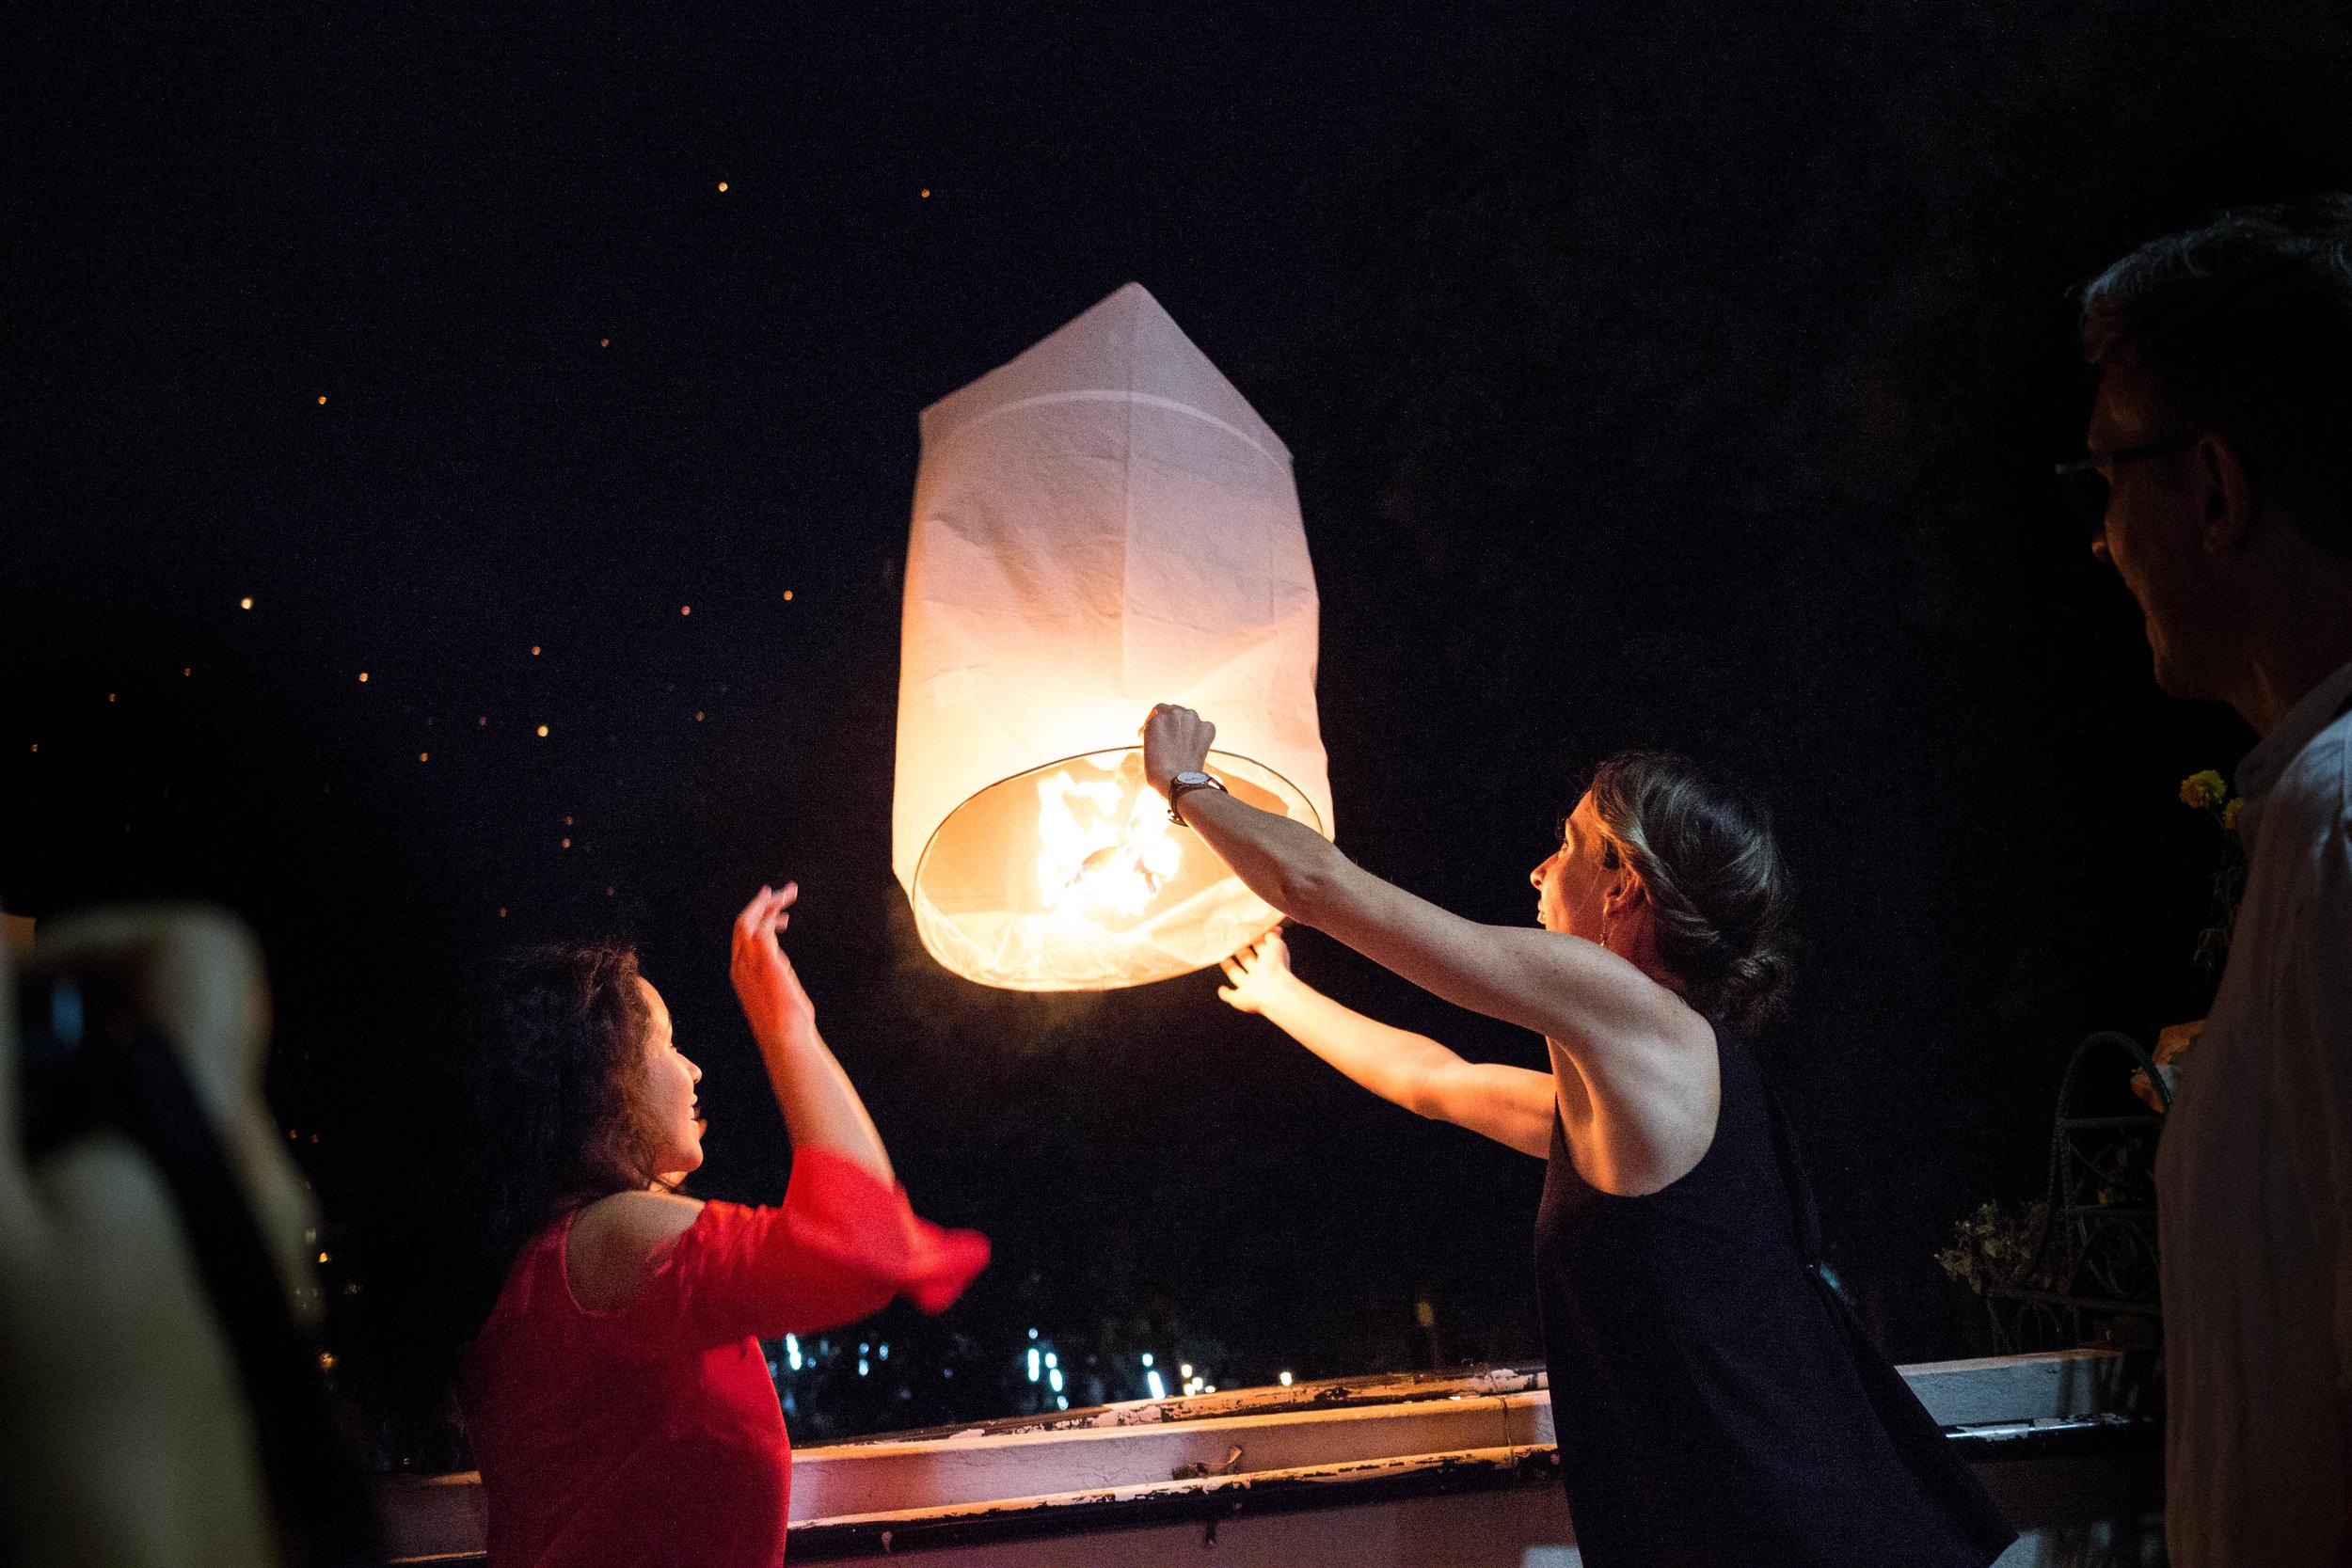 Releasing a lantern with my friend Jen from  The Travel Women